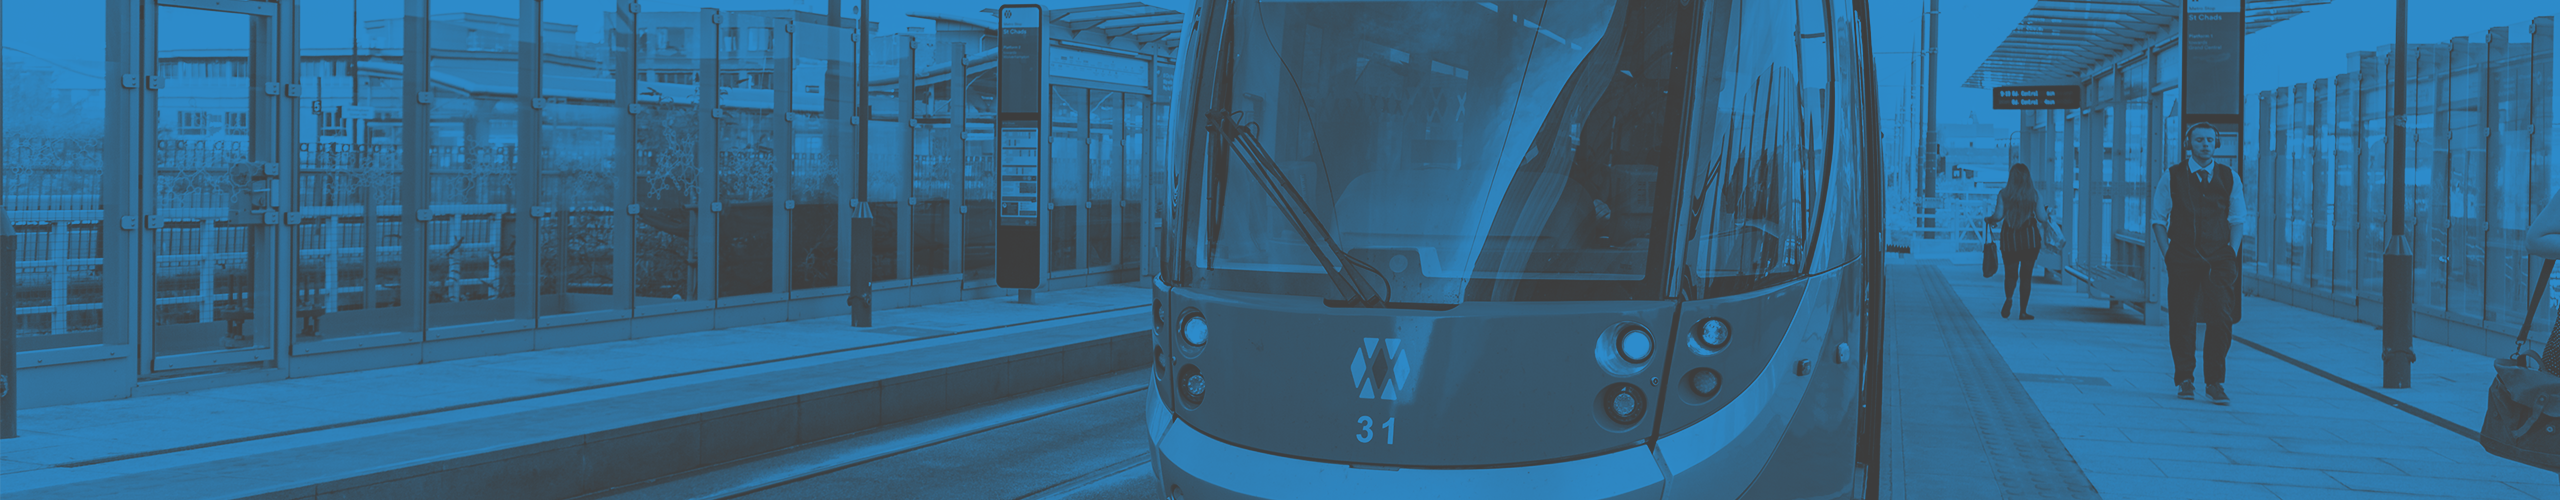 Tram To Mark Armistice Anniversary